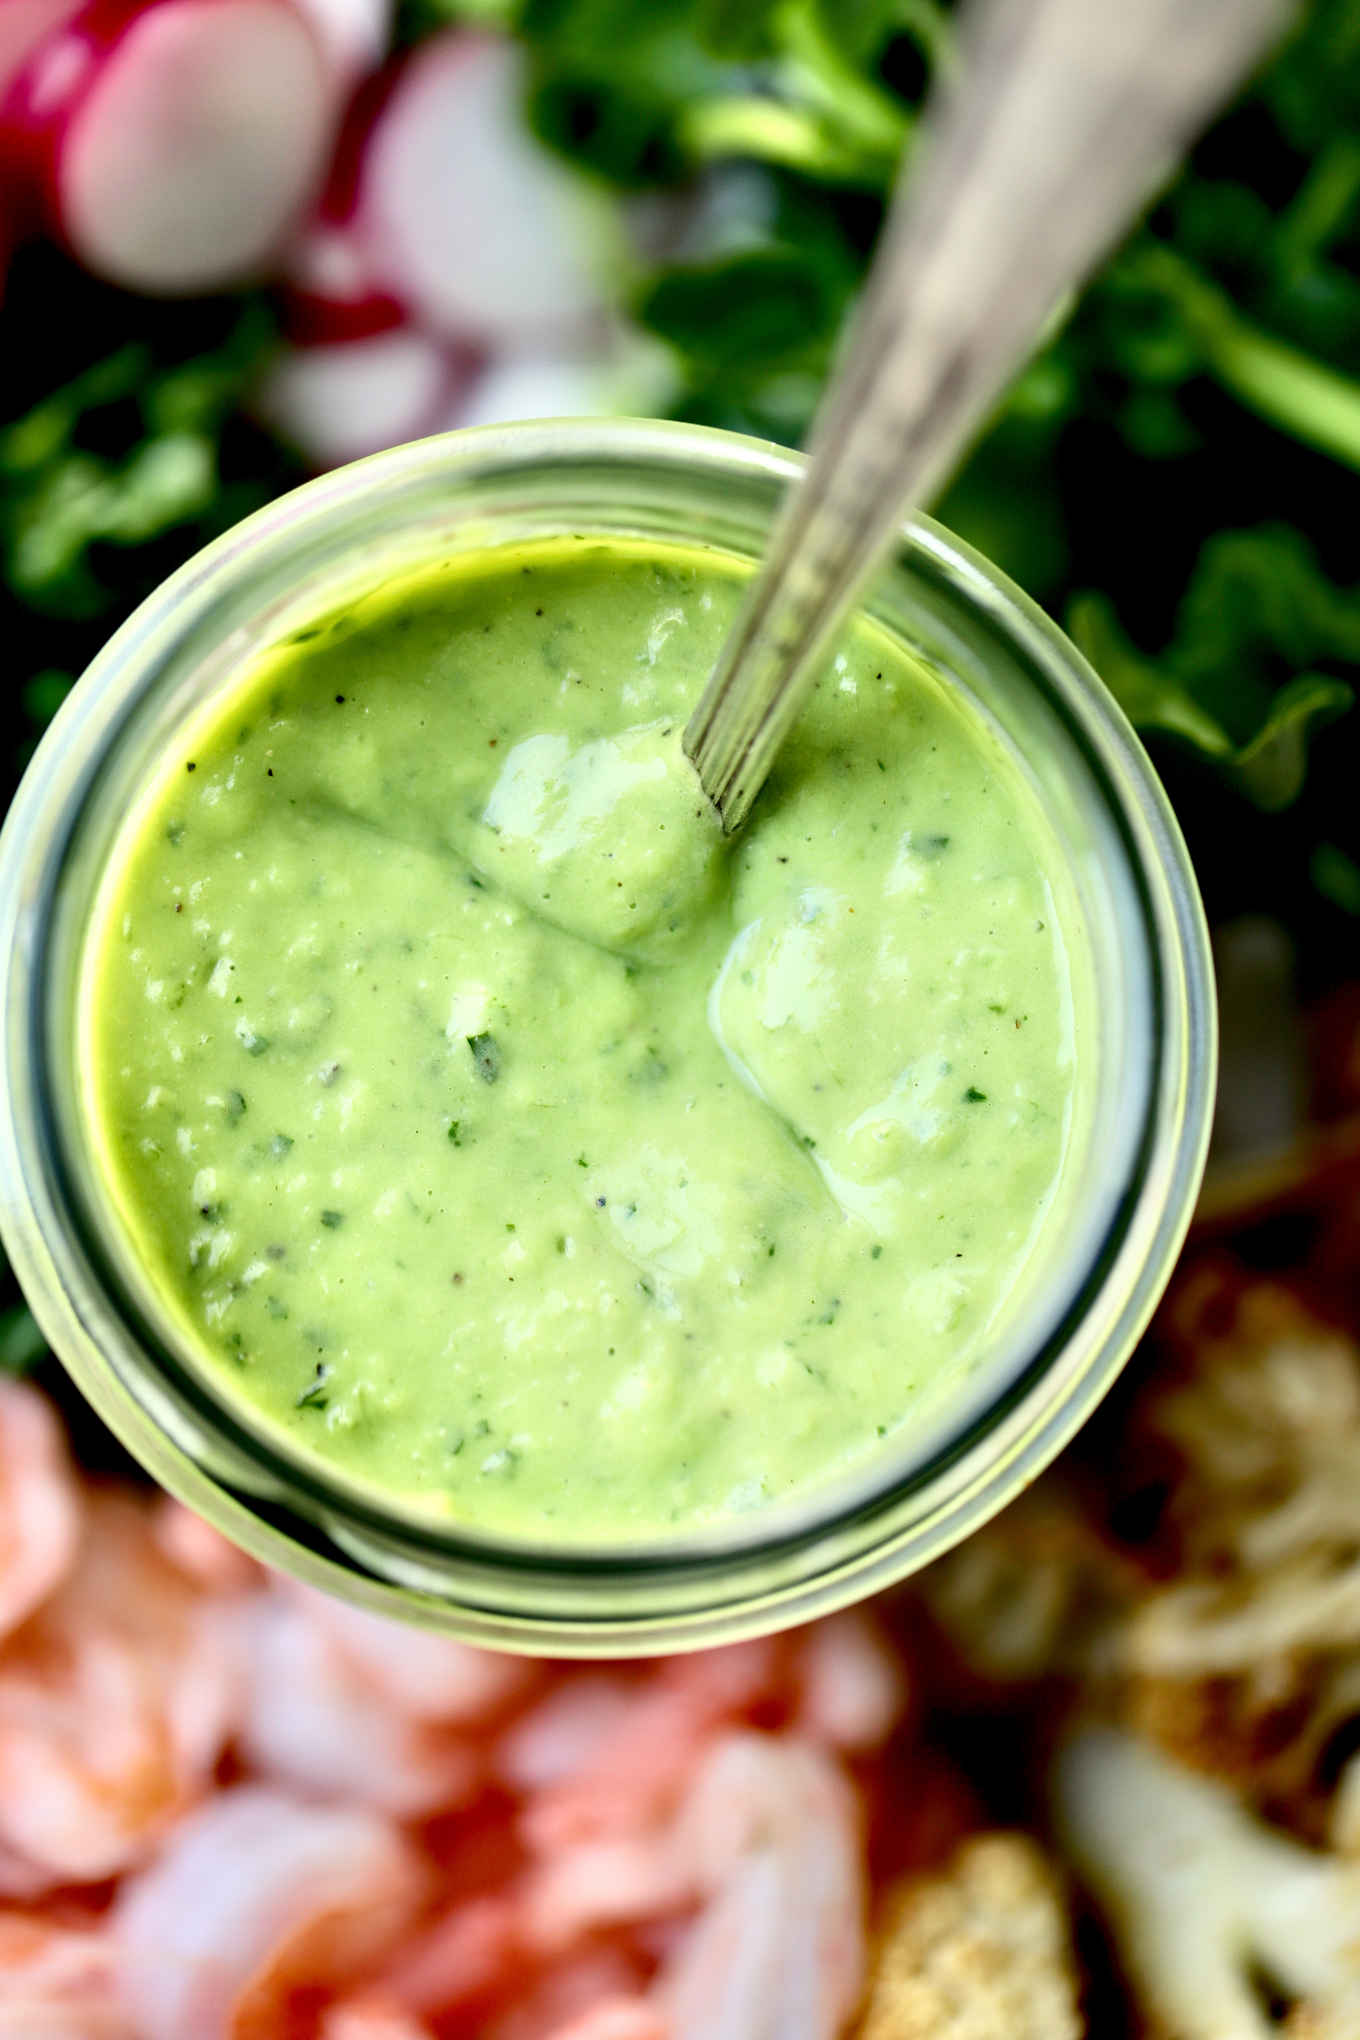 avocado green goddess dressing served on a salad platter of salad greens, cooked shrimps and roasted vegetables